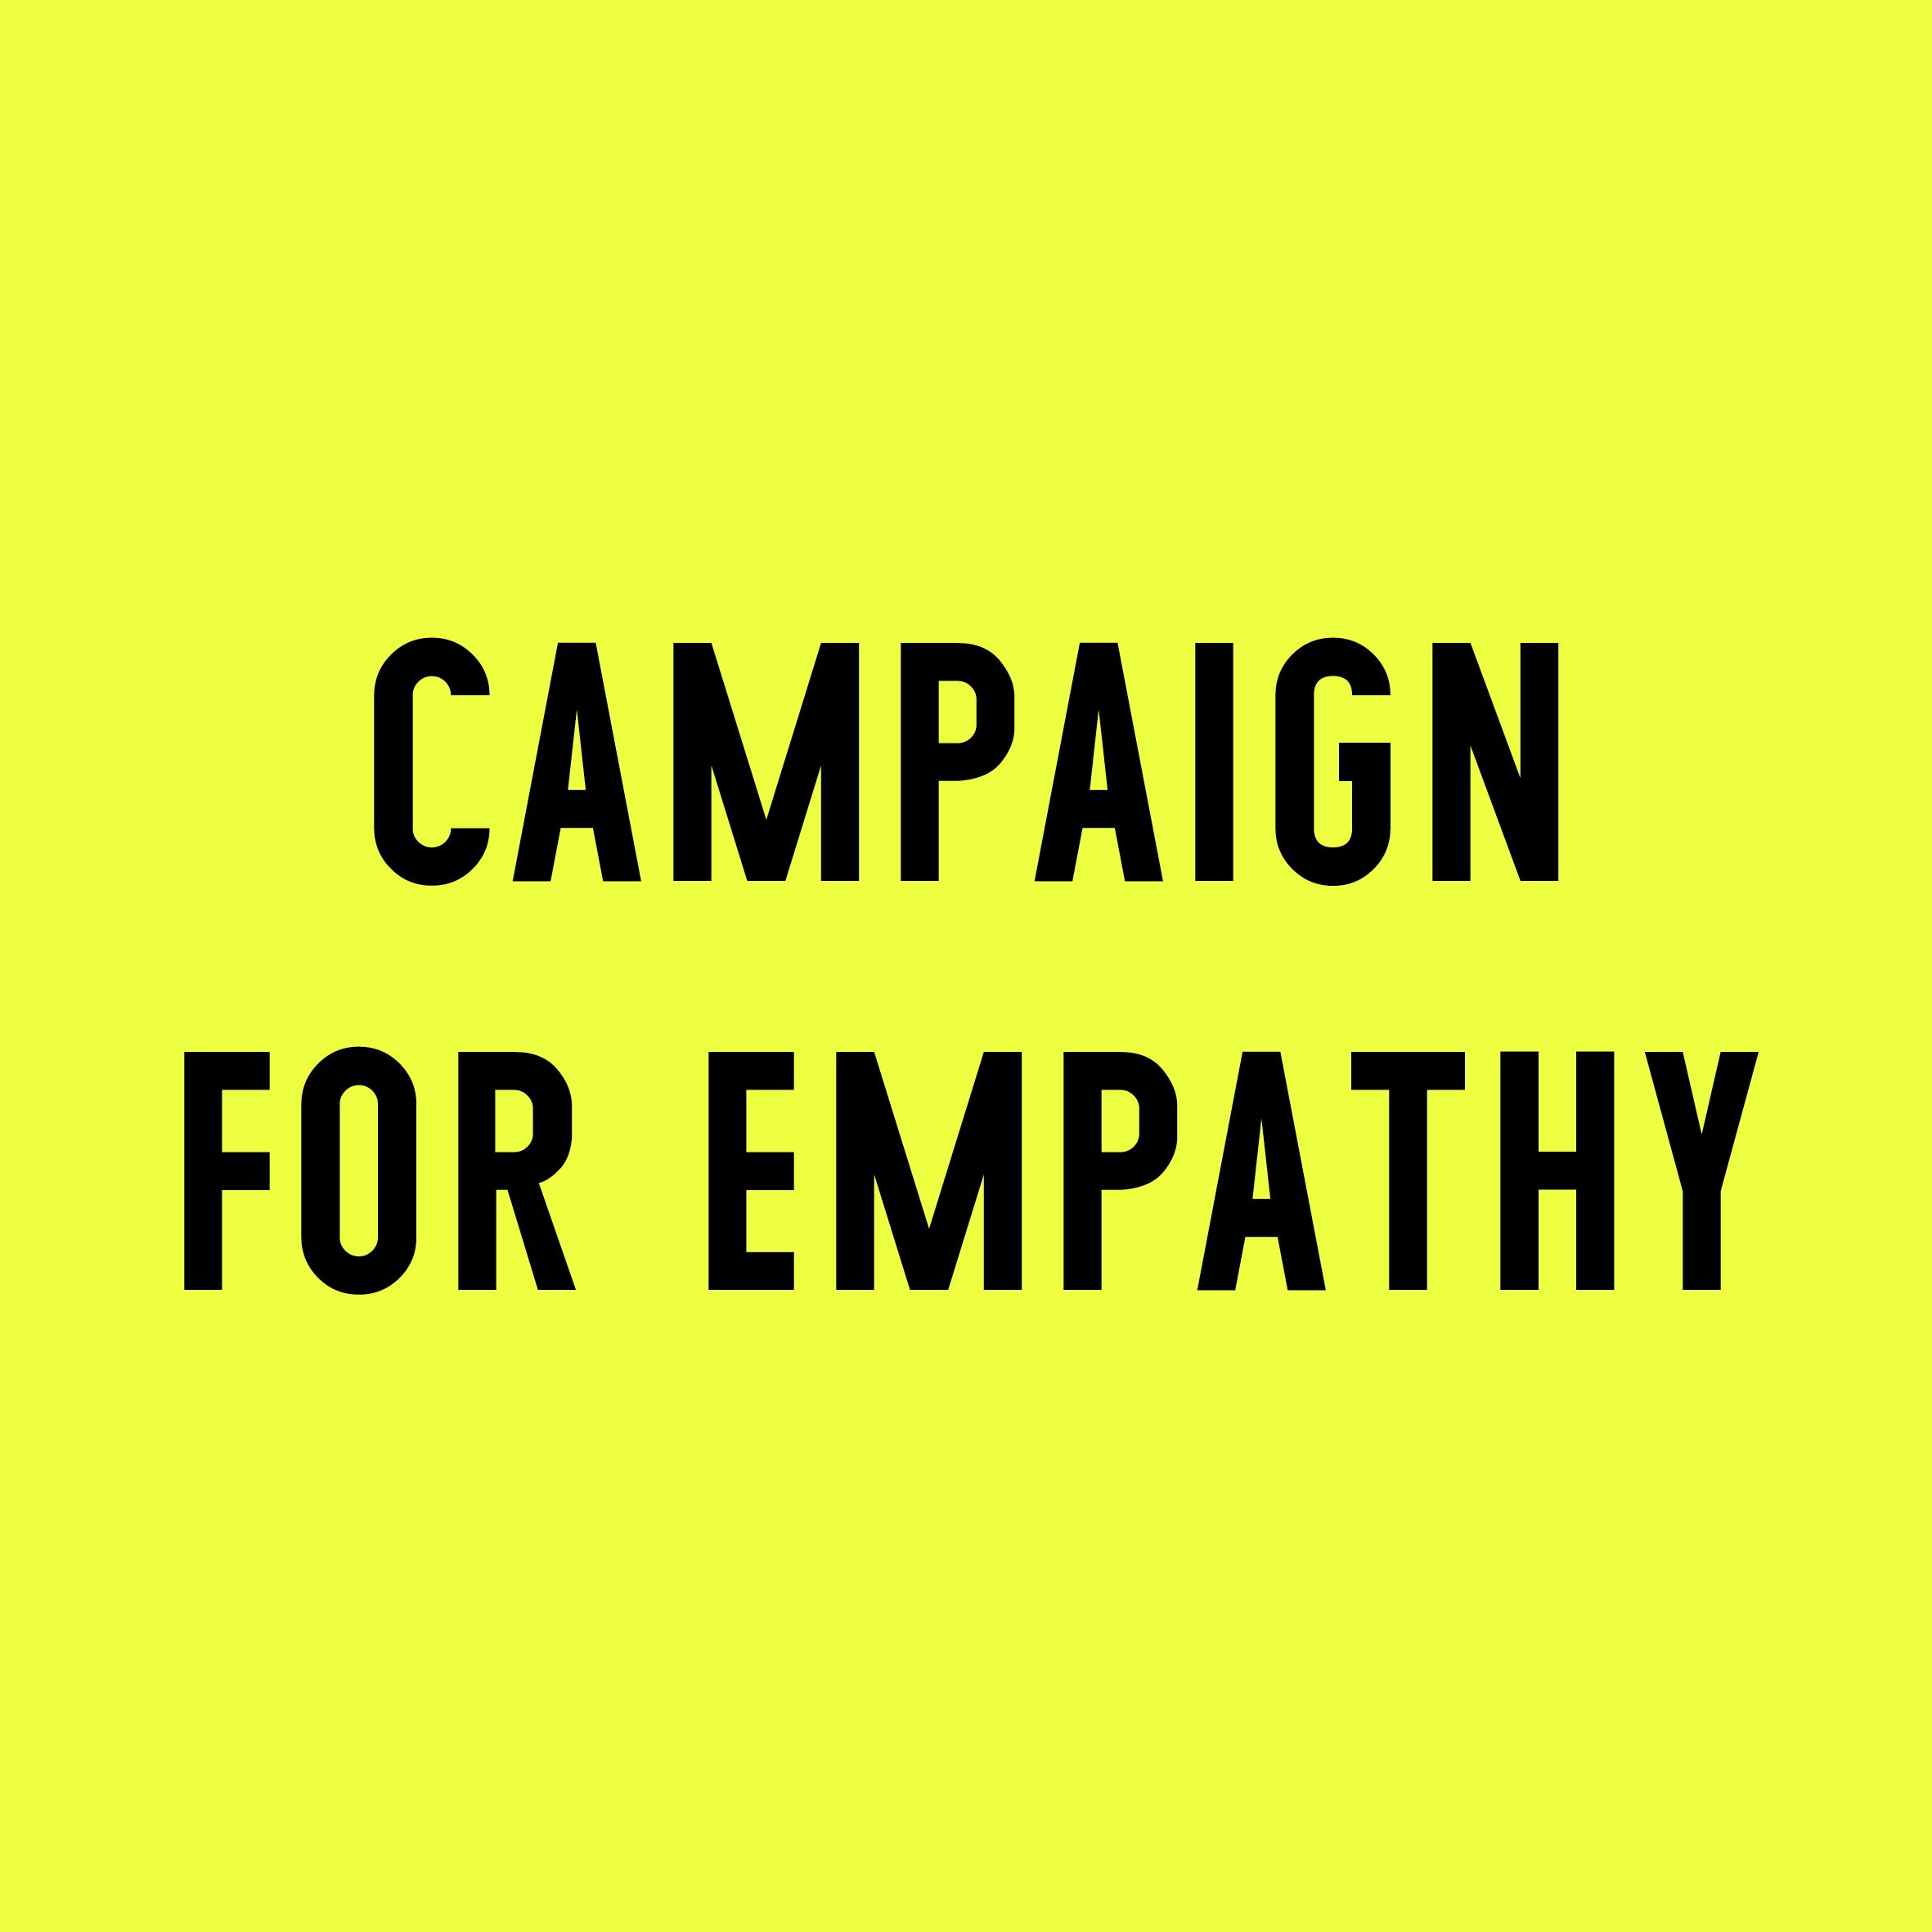 Enni-Kukka Tuomala, Campaign for Empathy logo